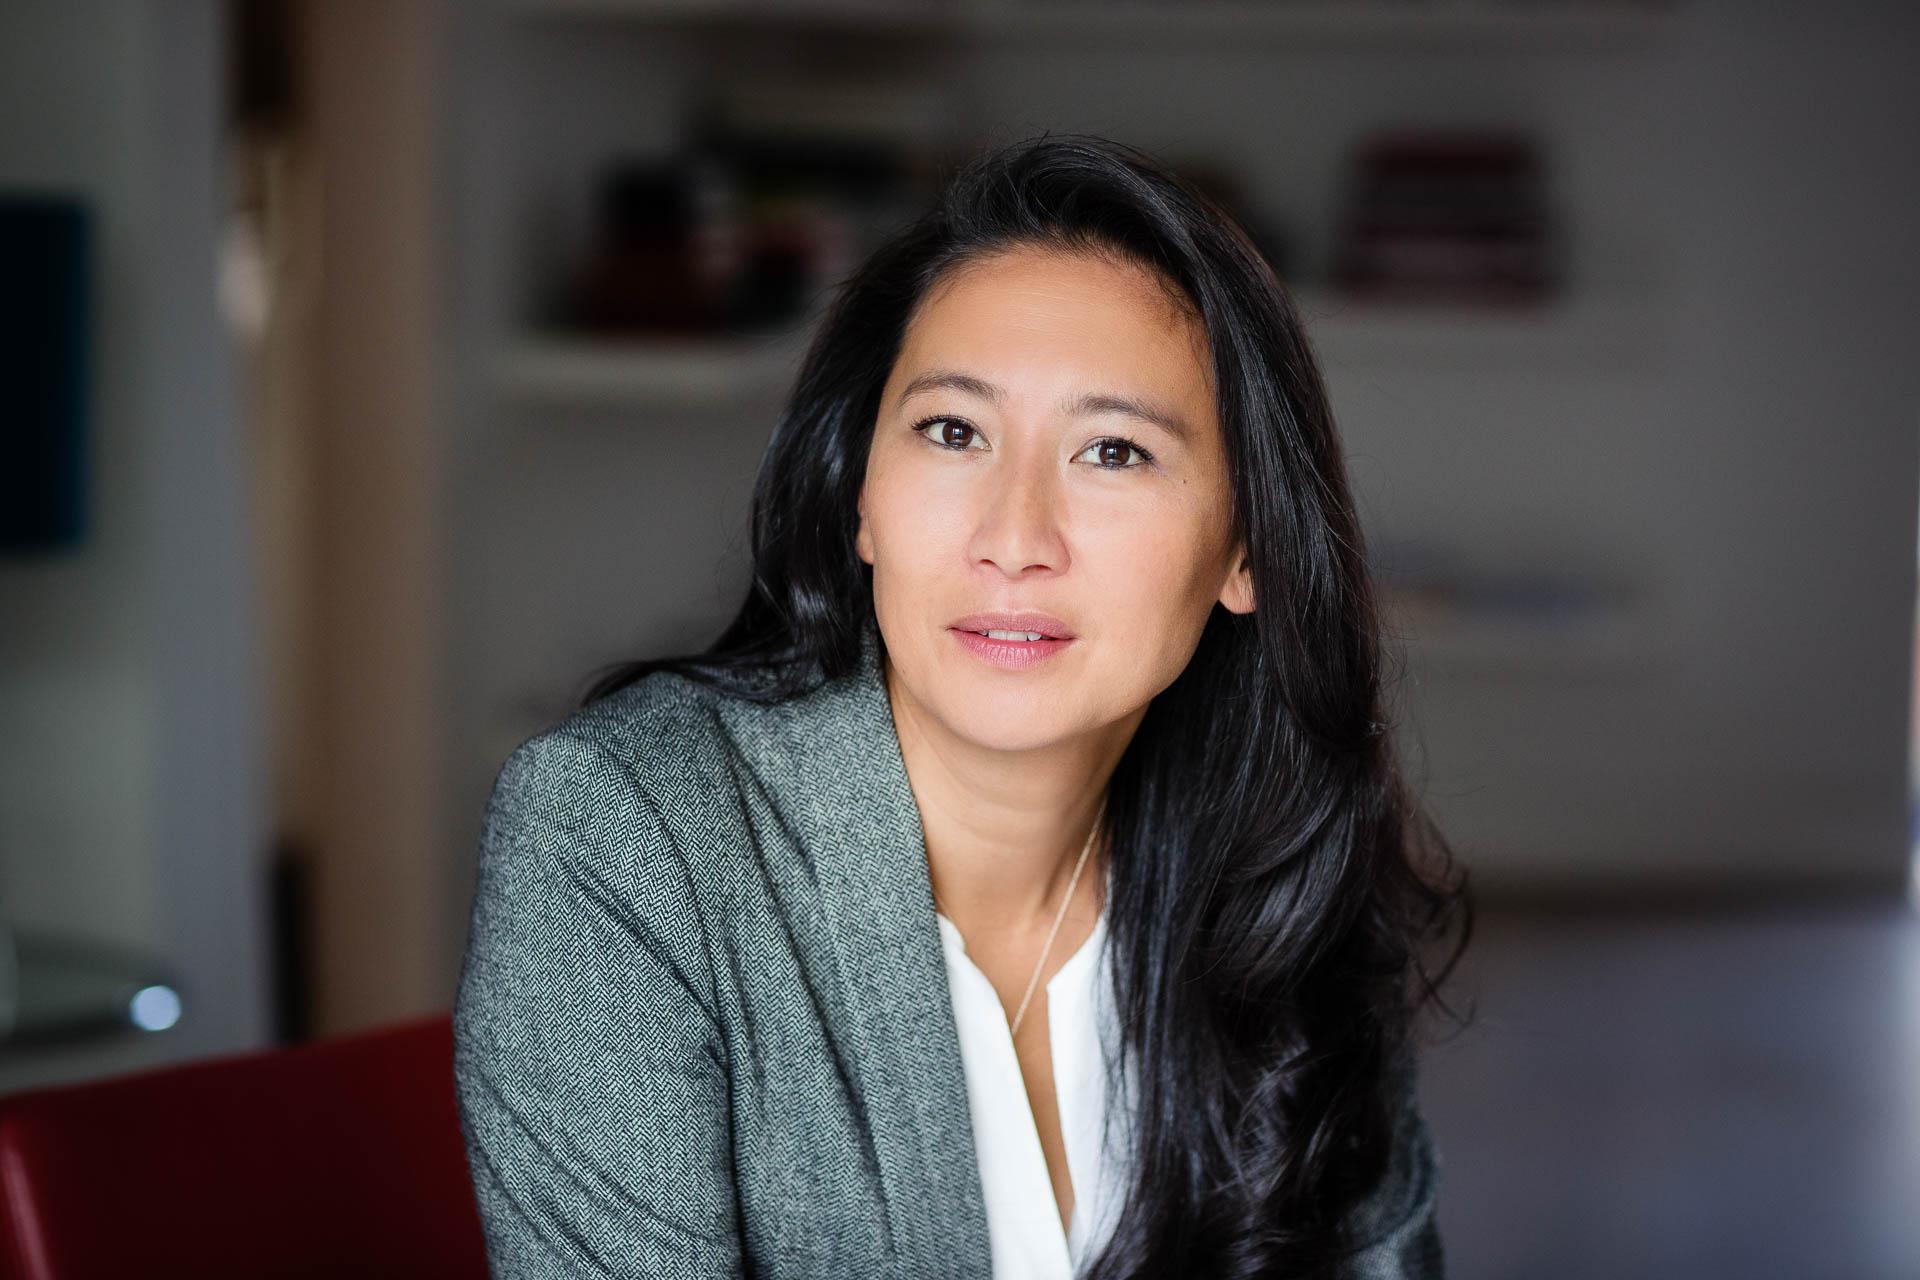 studio portrait of businesswoman in suit with long dark hair